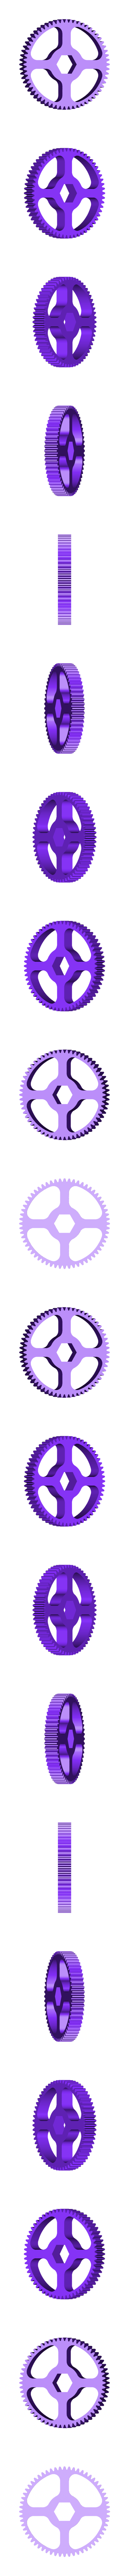 Gear_Wheel_Base_60_Teeth.stl Download free STL file Hummingbird • 3D printing model, gzumwalt